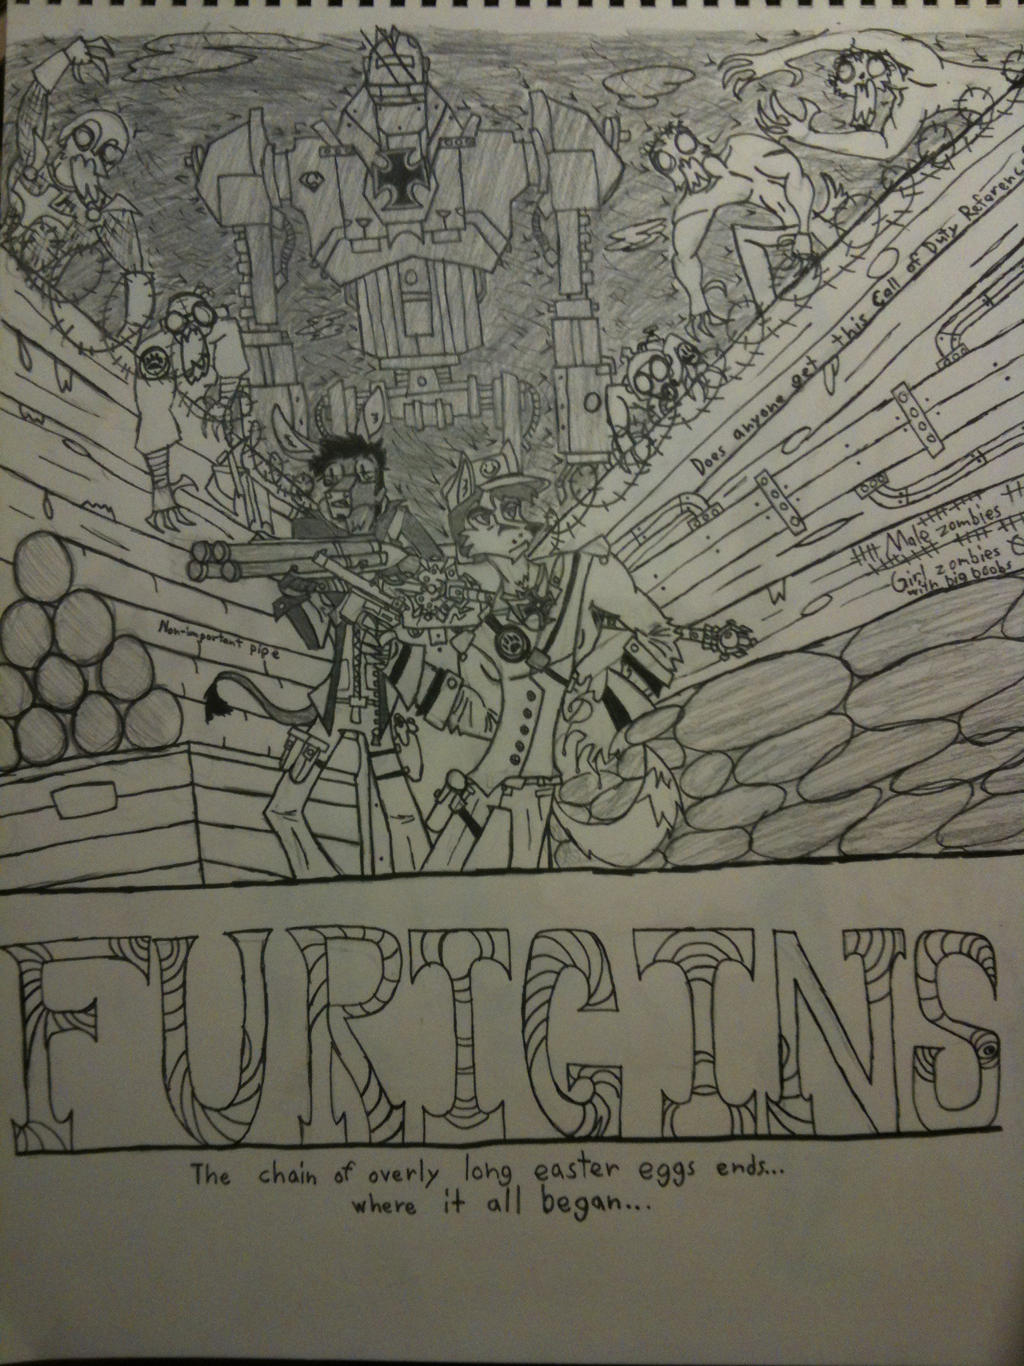 Furigins (Trade) by thedestoryerofworlds